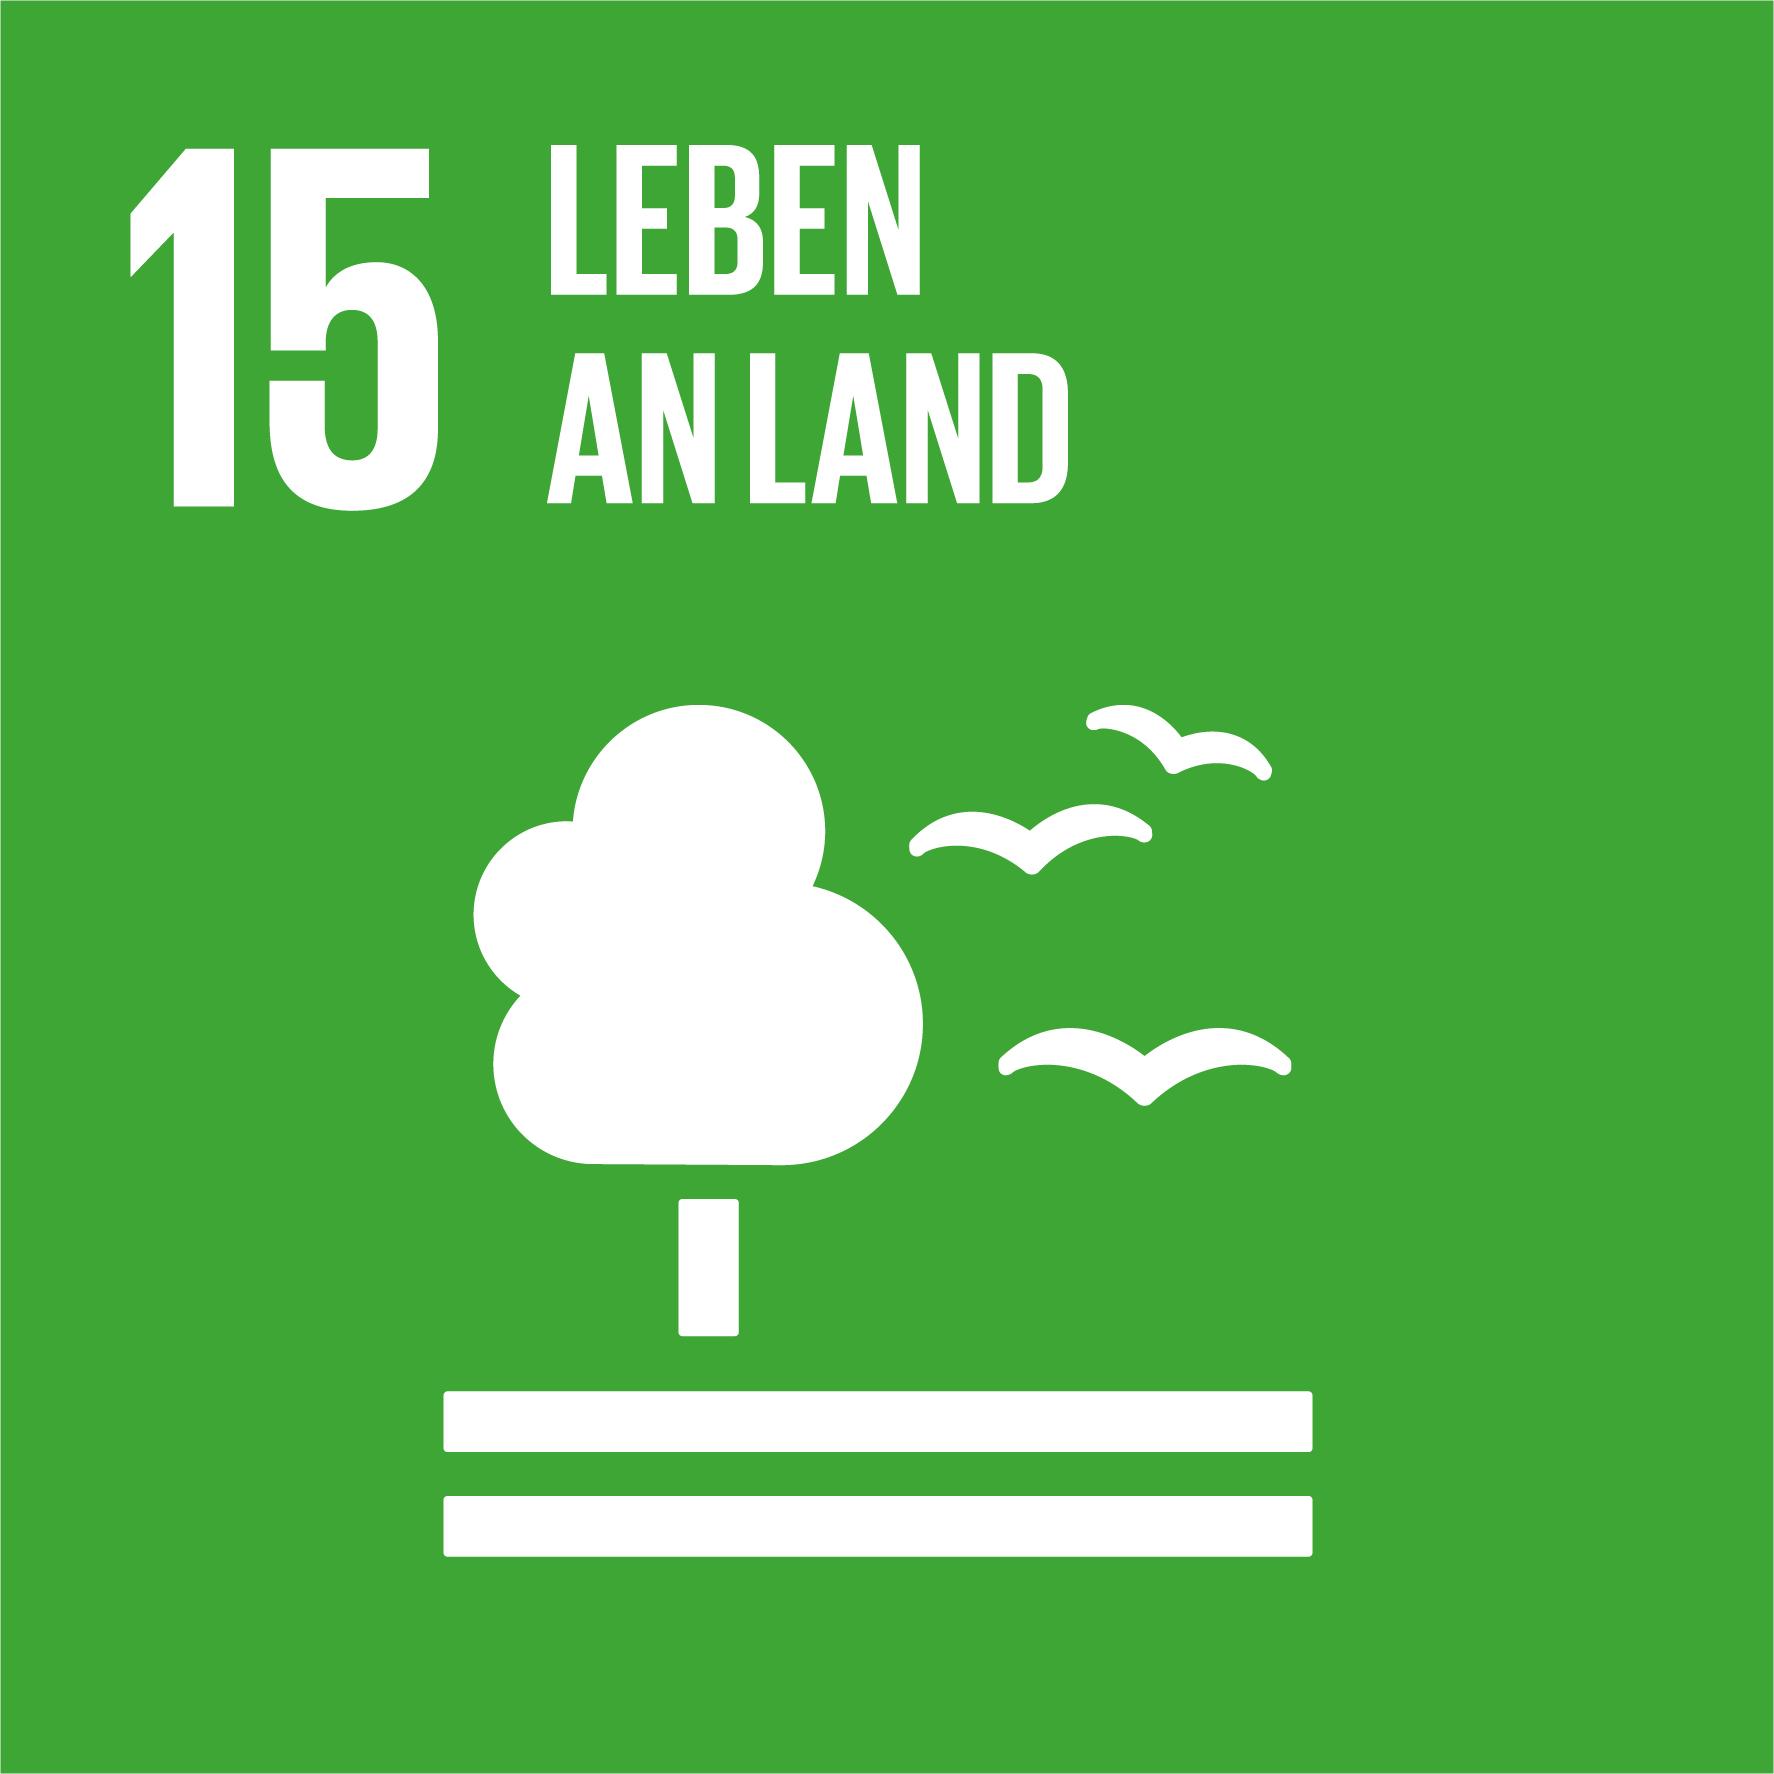 Regensburger Nachhaltigkeitswoche - SDG 15